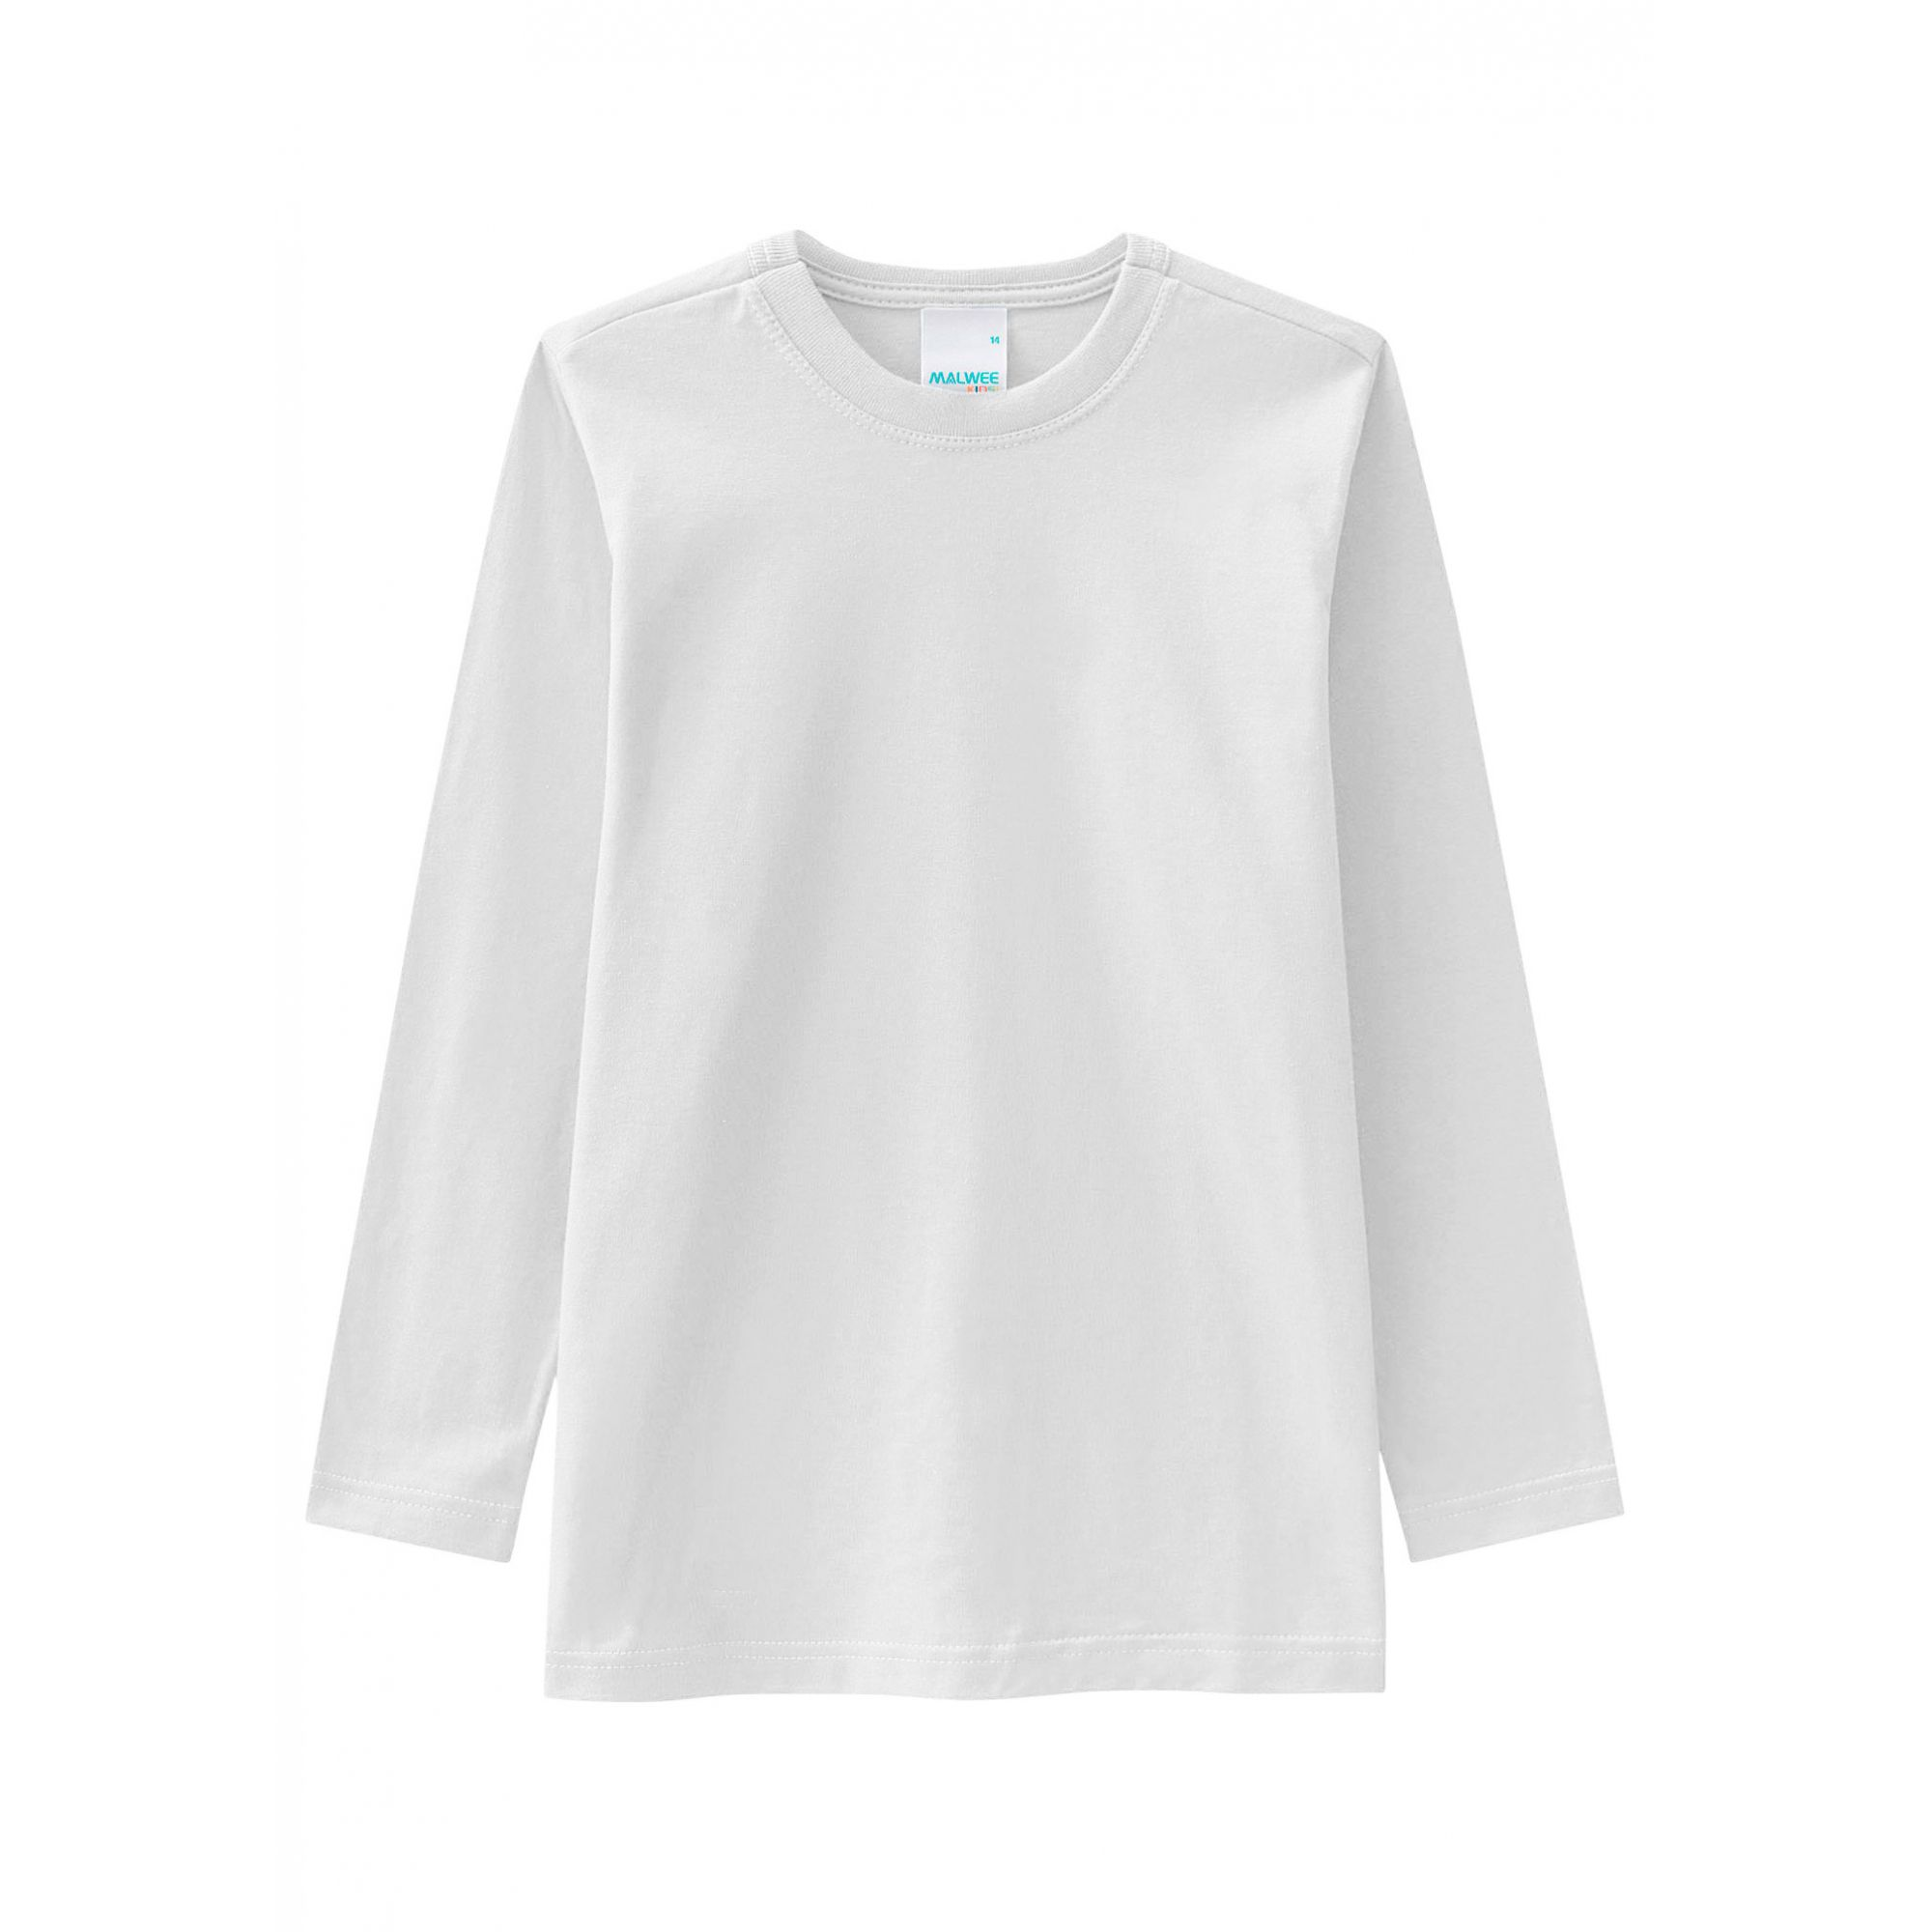 Camiseta Infantil Masculina Inverno Branca Malwee